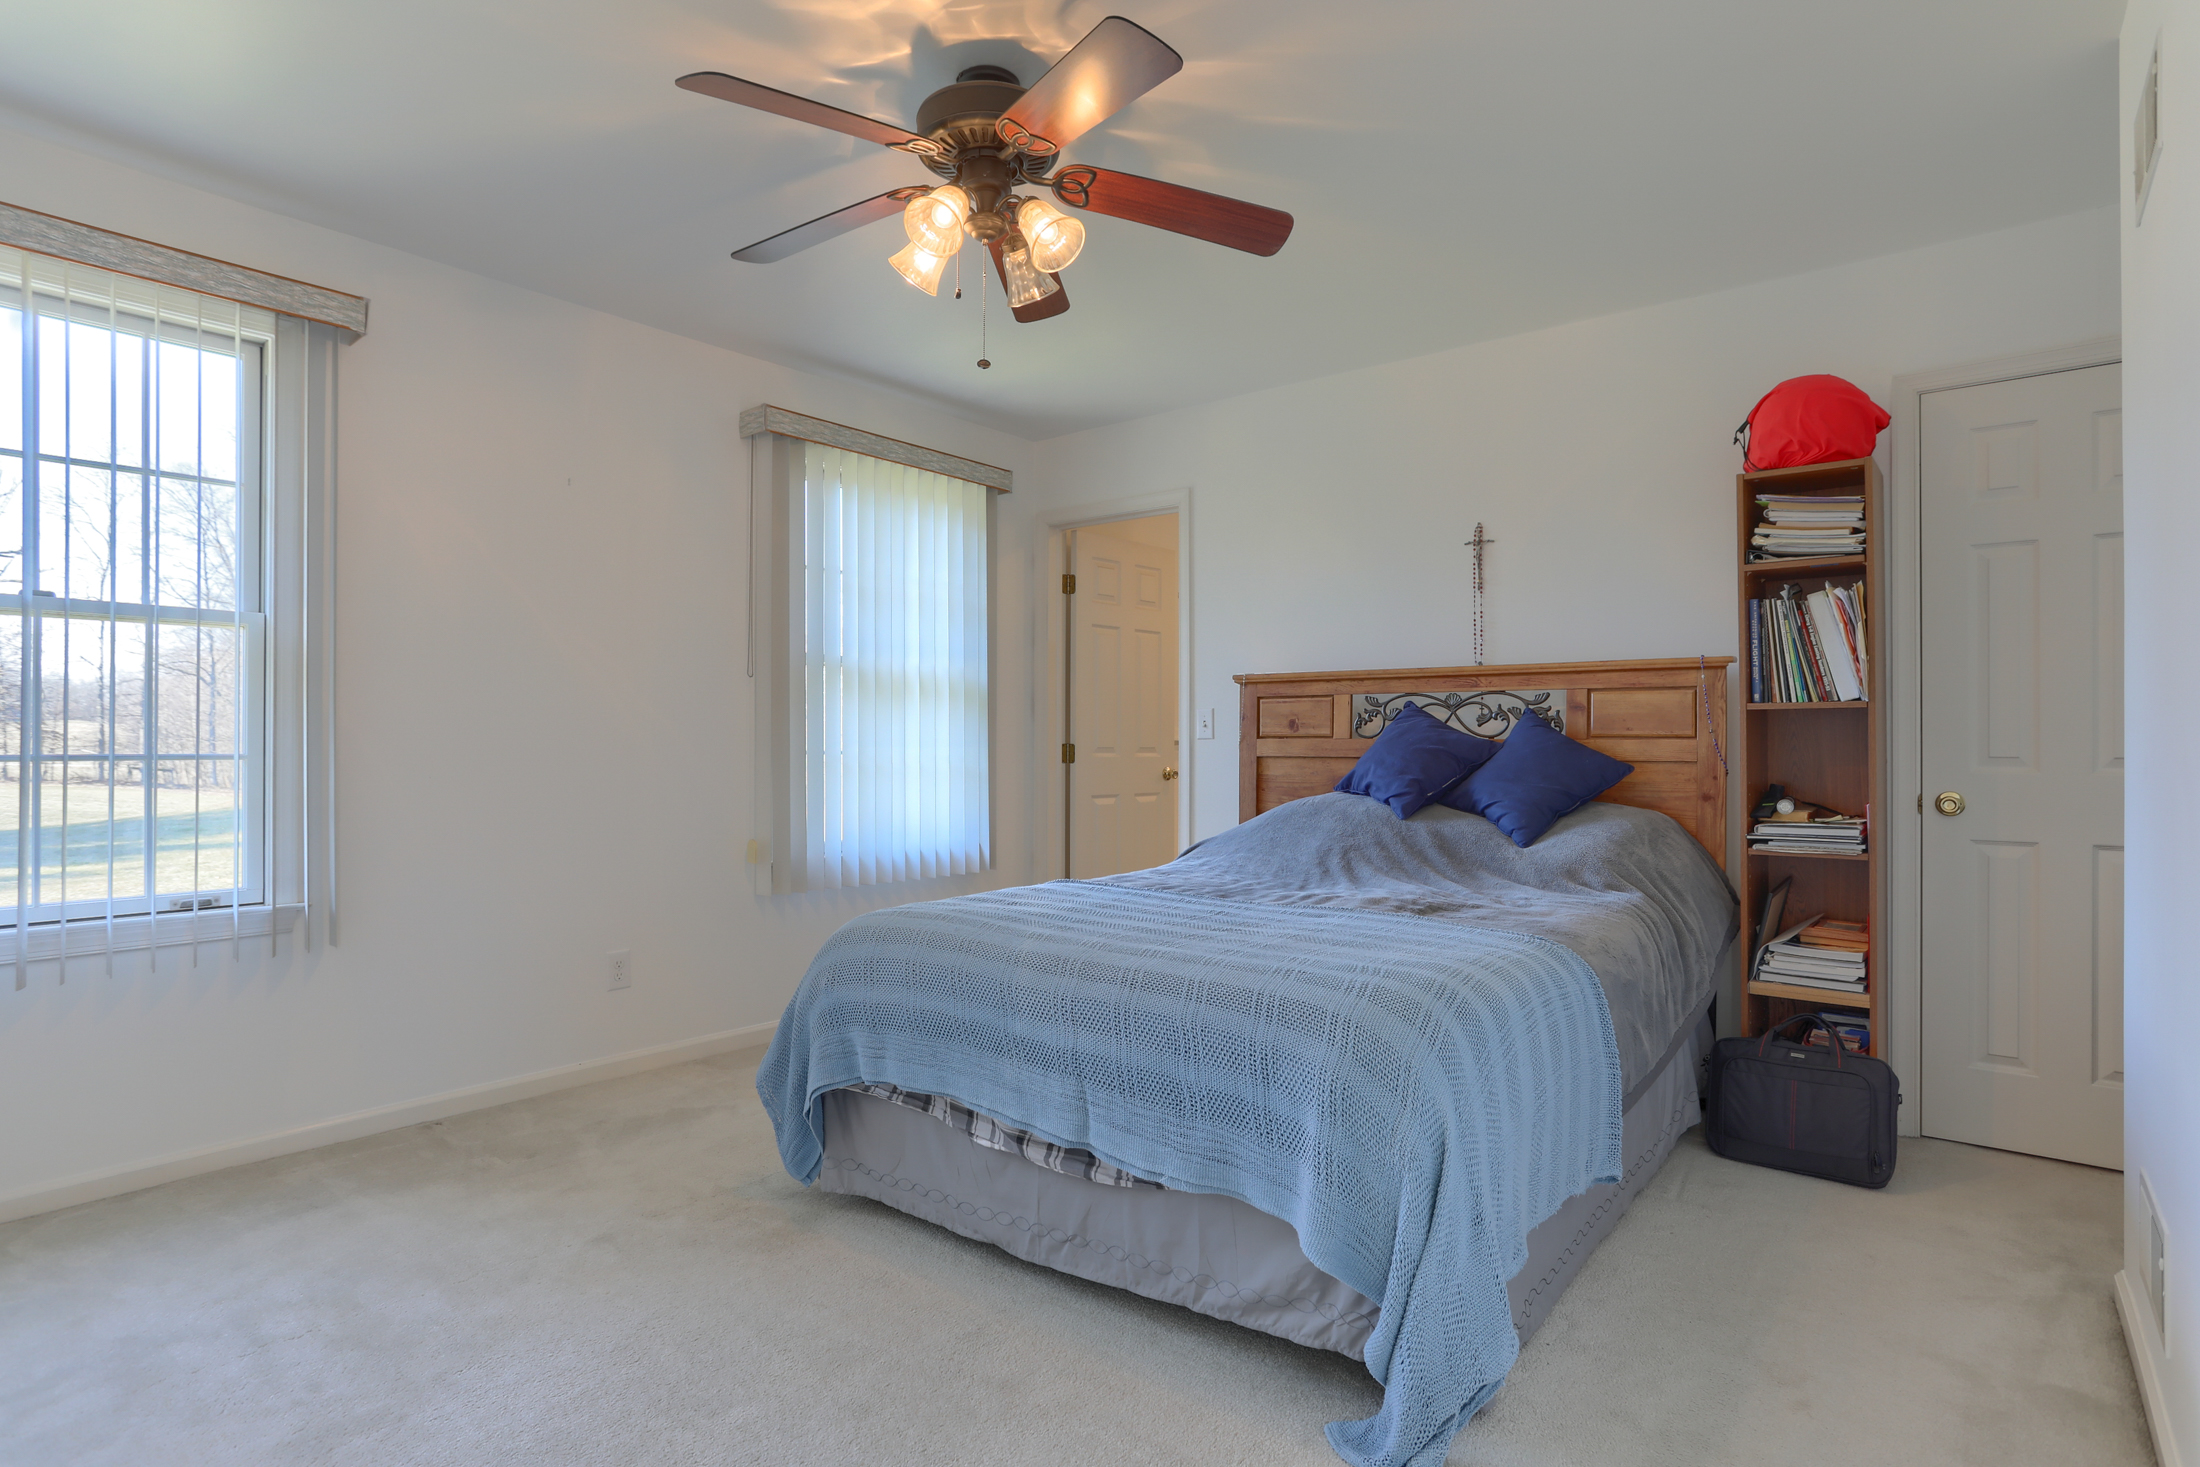 26 W. Strack Drive - 2nd Bedroom